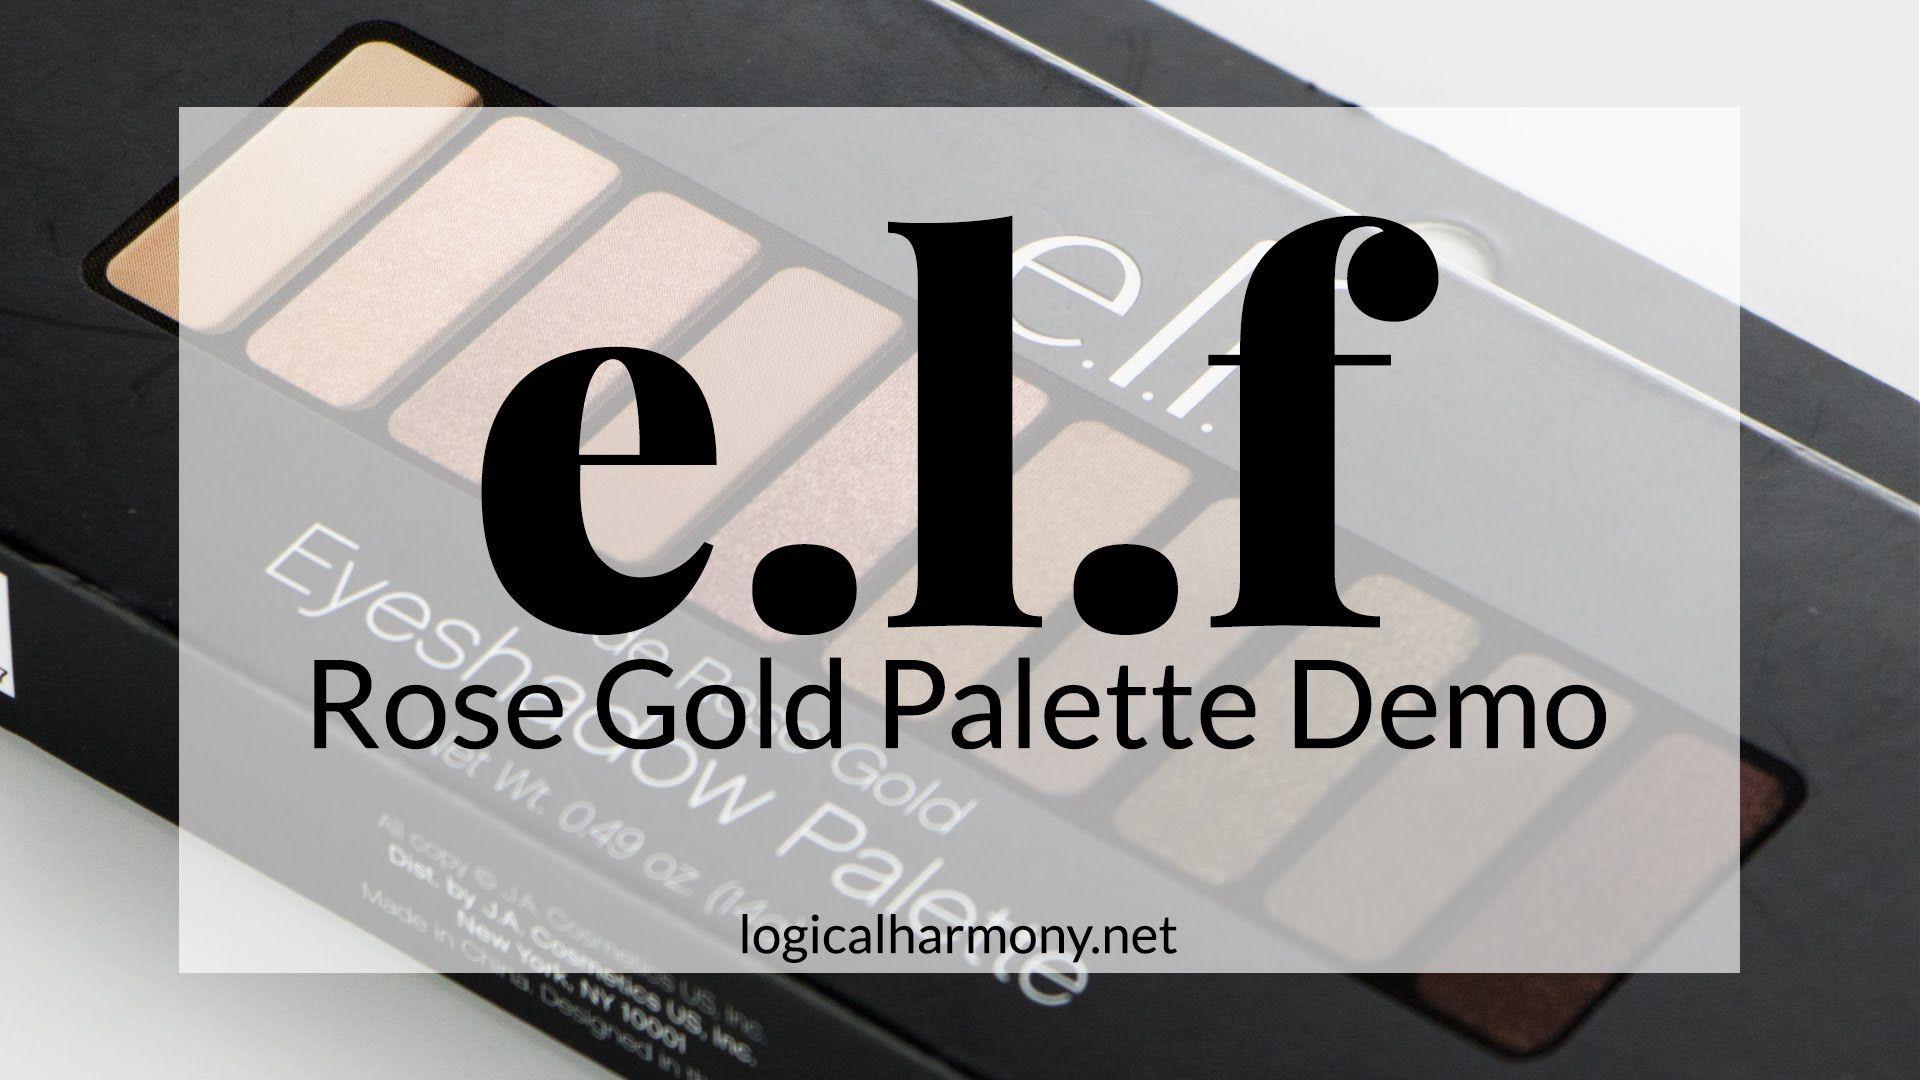 ELF Rose Gold Shadow Palette Demo (Cruelty Free & Vegan